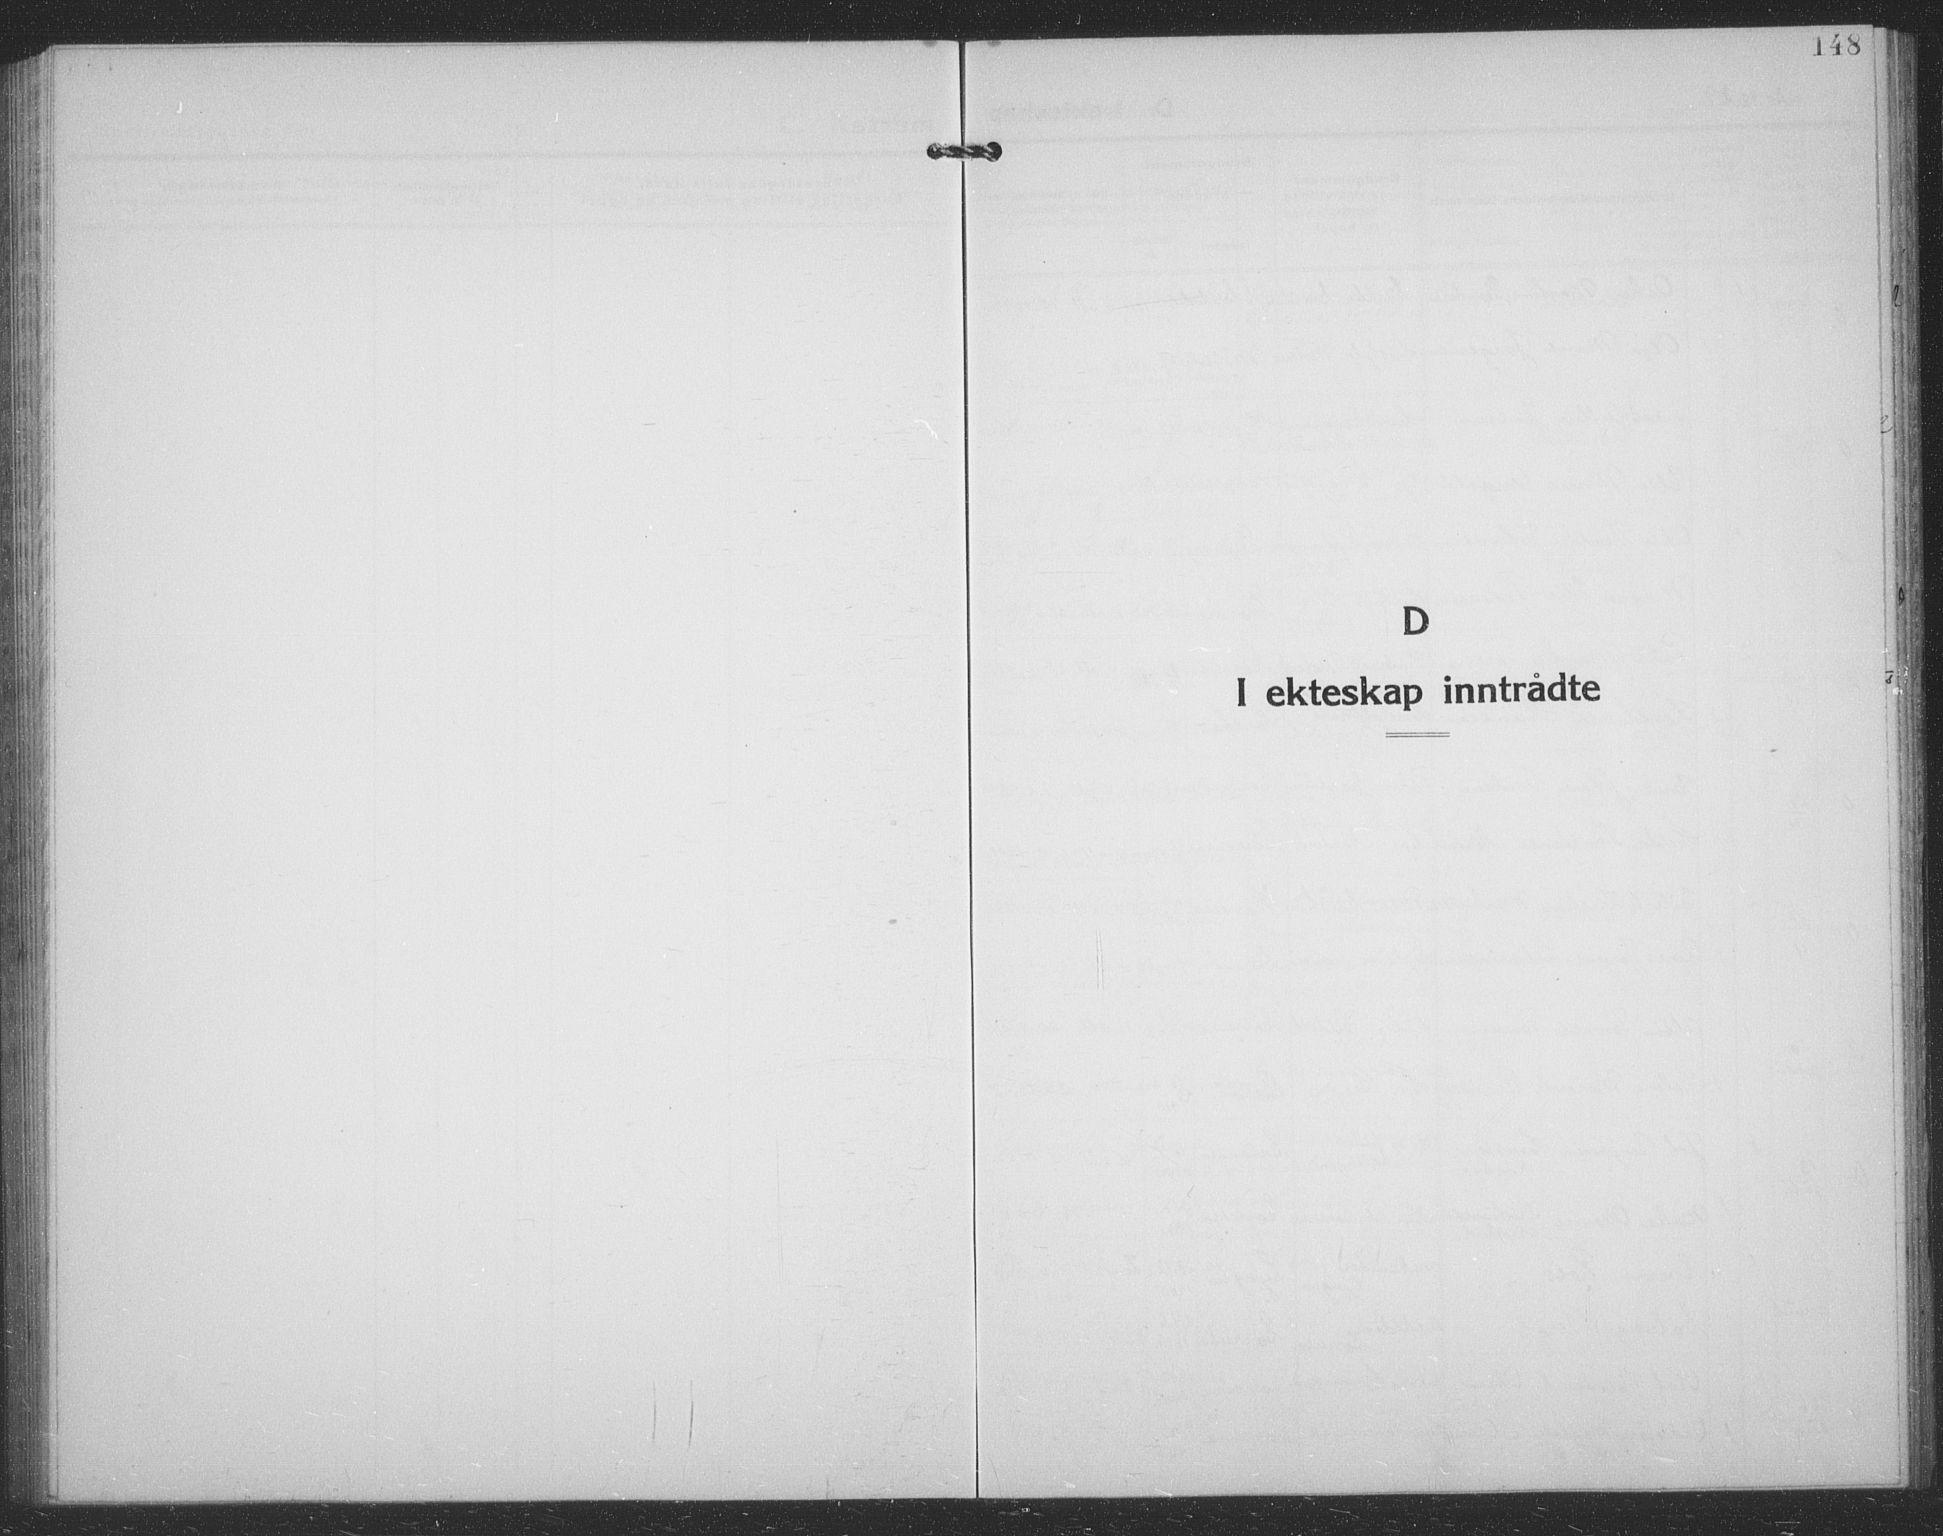 SATØ, Tranøy sokneprestkontor, I/Ia/Iab/L0024klokker: Klokkerbok nr. 24, 1929-1943, s. 148